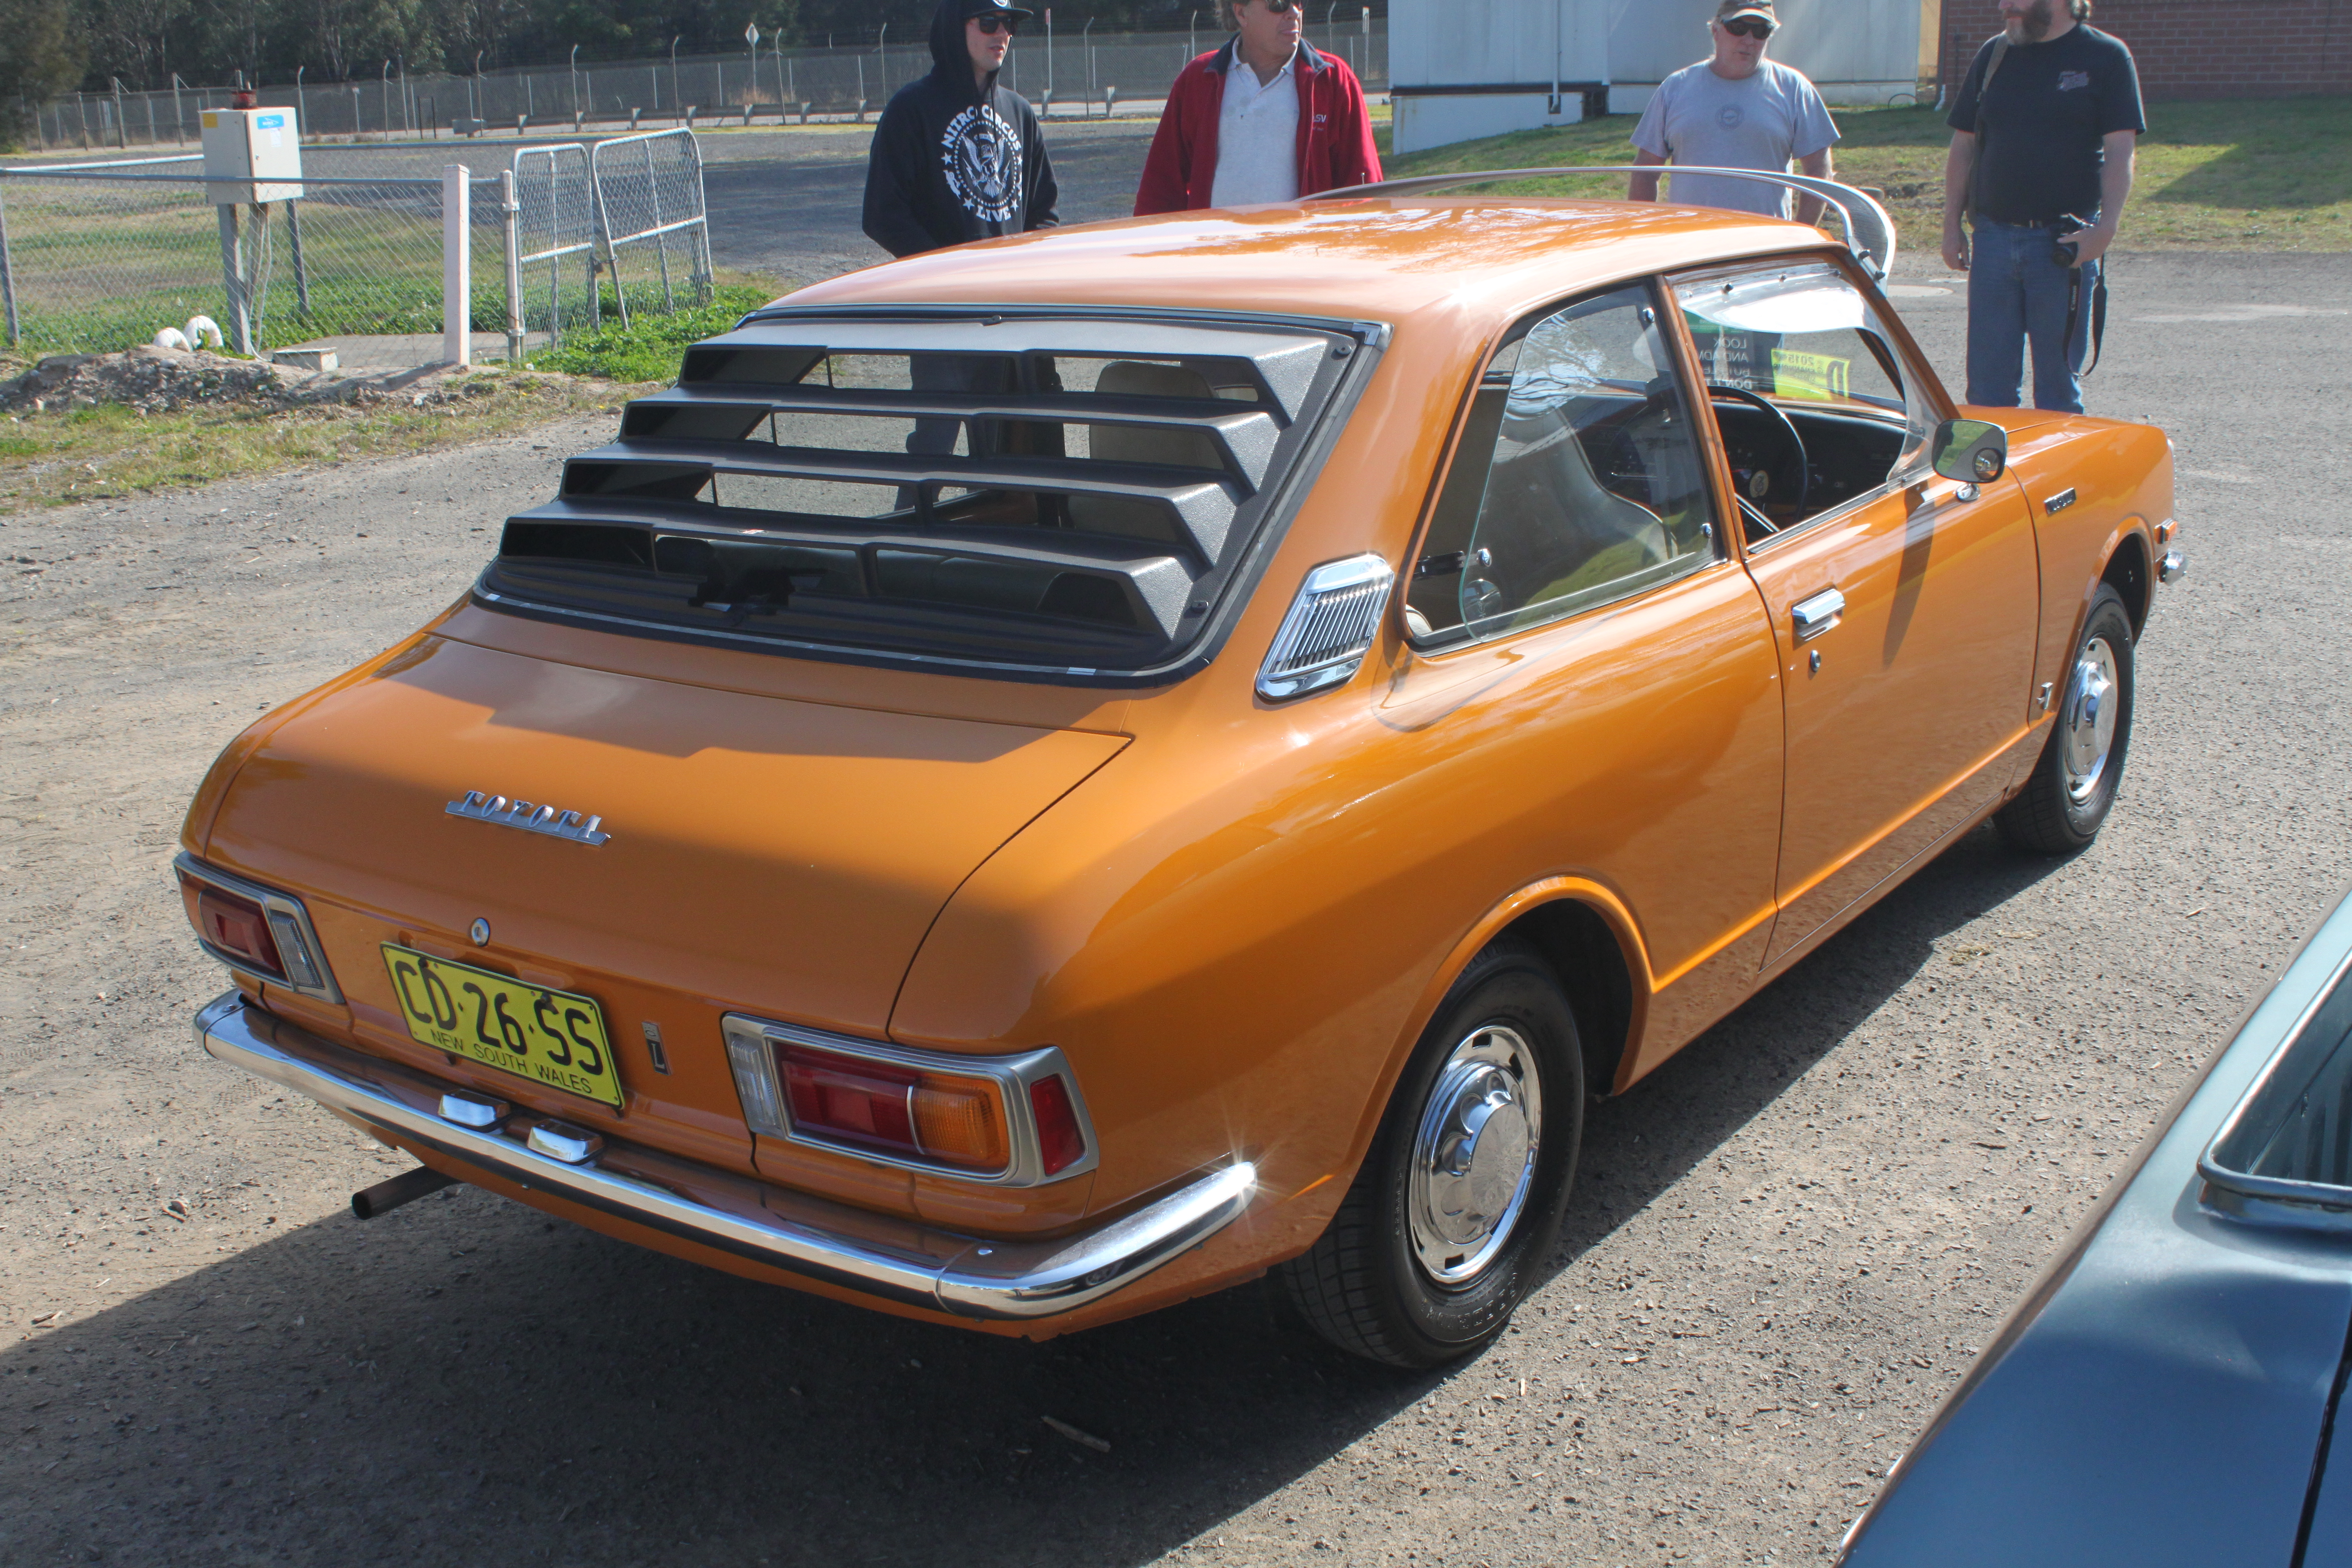 Kelebihan Kekurangan Toyota Corolla 1974 Review